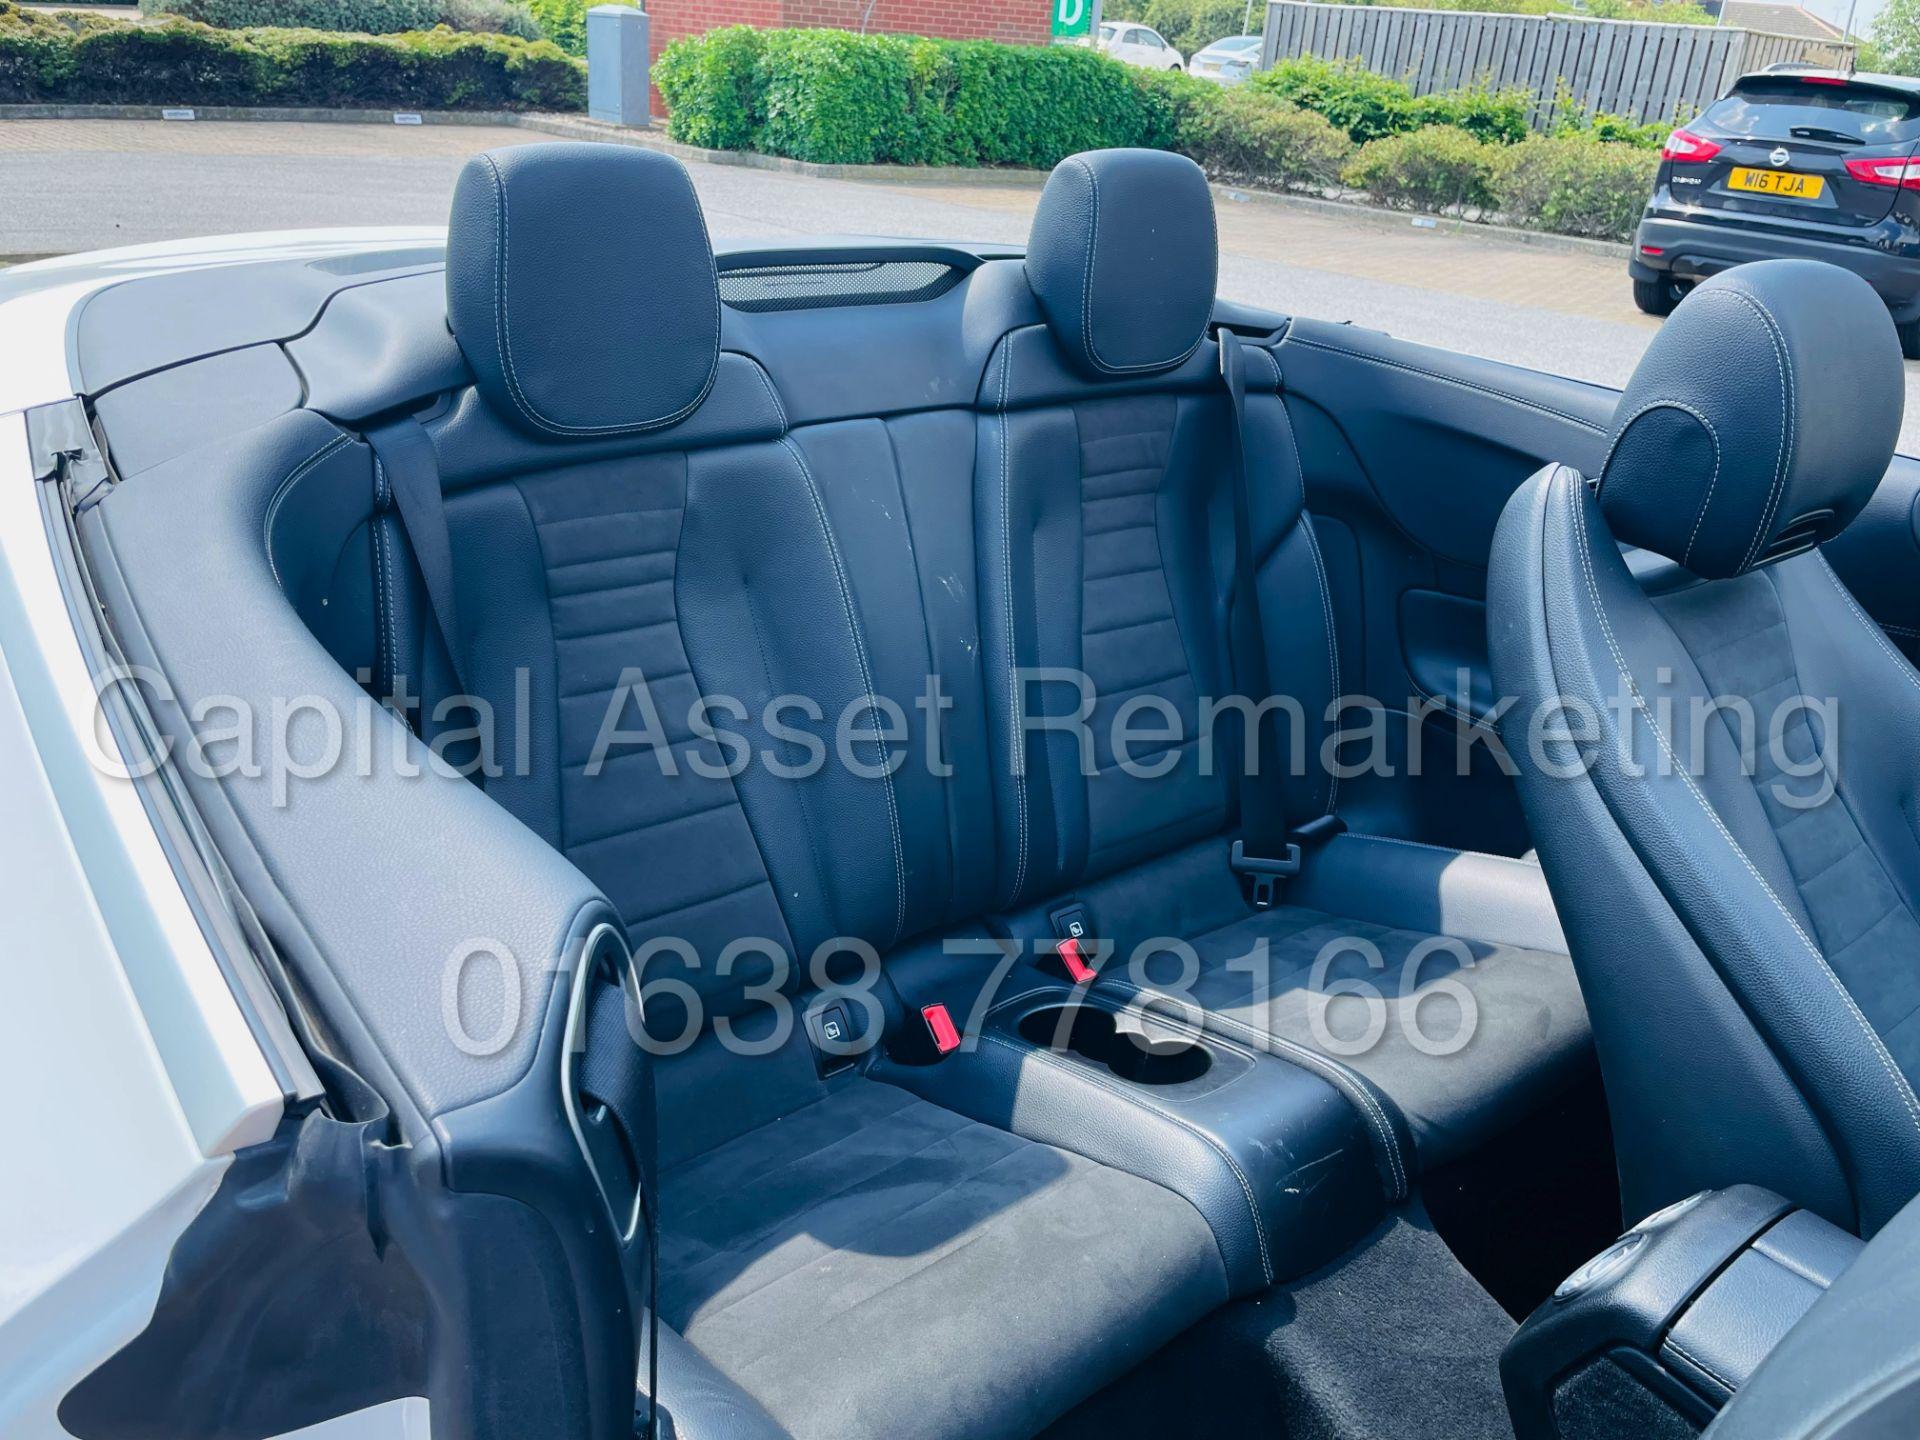 MERCEDES-BENZ E220d *AMG LINE PREMIUM - CABRIOLET* (2018 - EURO 6) '9G AUTO - LEATHER - SAT NAV' - Image 44 of 63